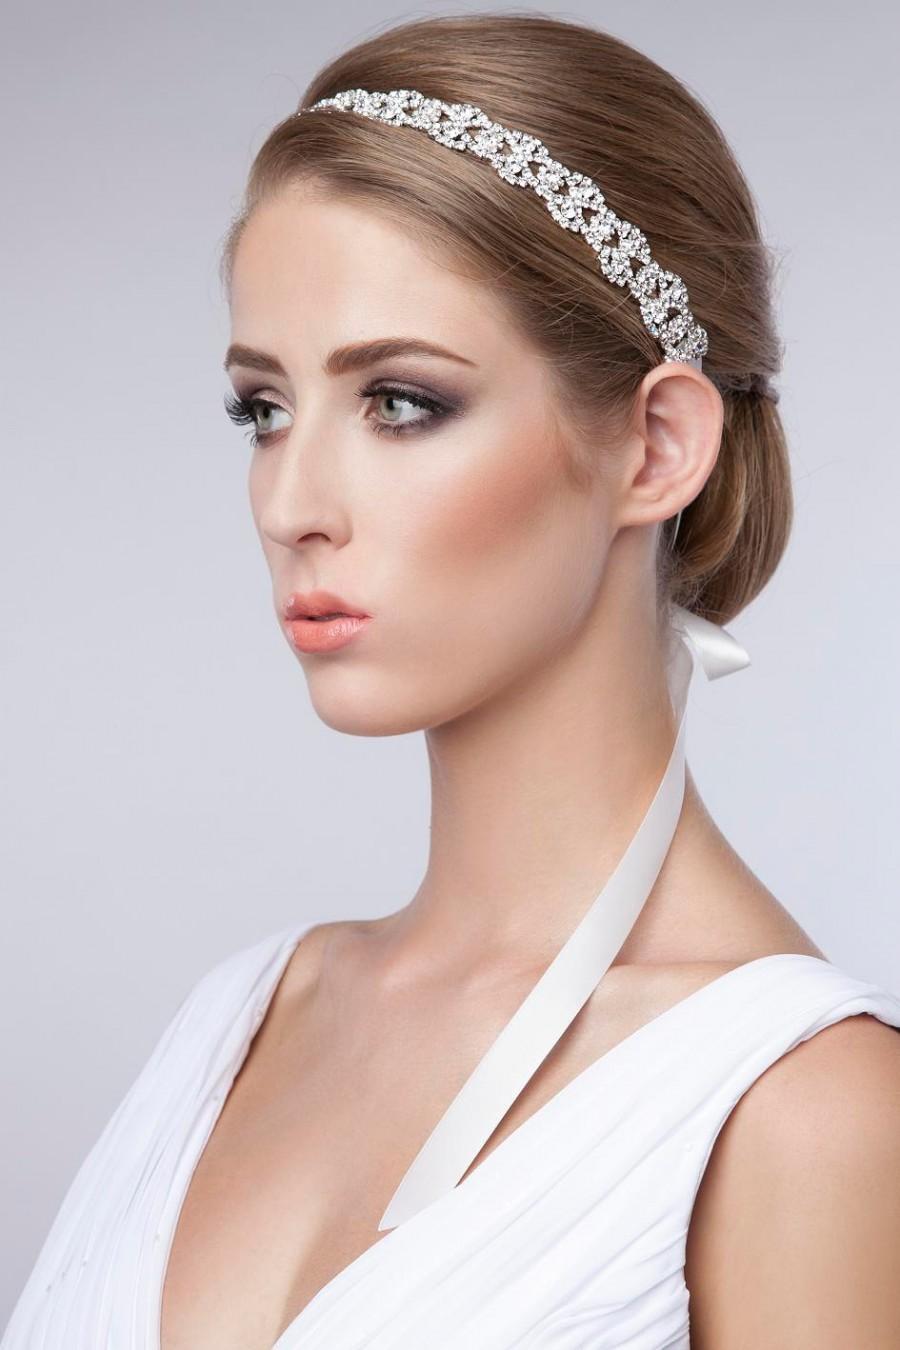 Rhinestone Headband Bridal Wedding Crystal Halo Tie On Ribbon Headpiece 1920s Flapper